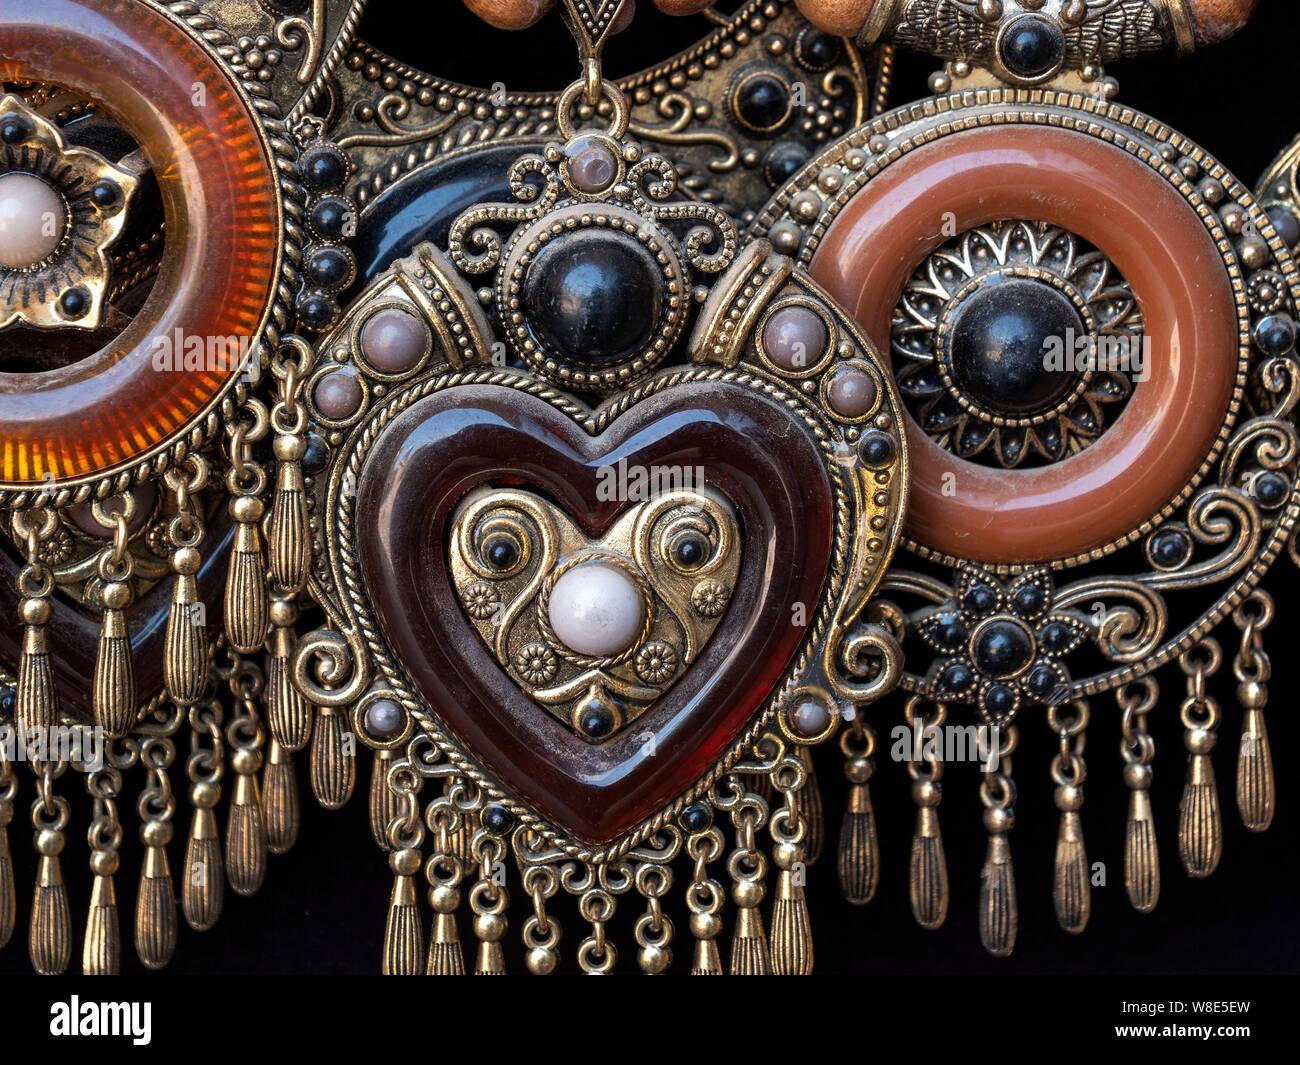 jewellery schmuck jewelry stock photos & jewellery schmuck schmucks podcast schmuck c 29 #10